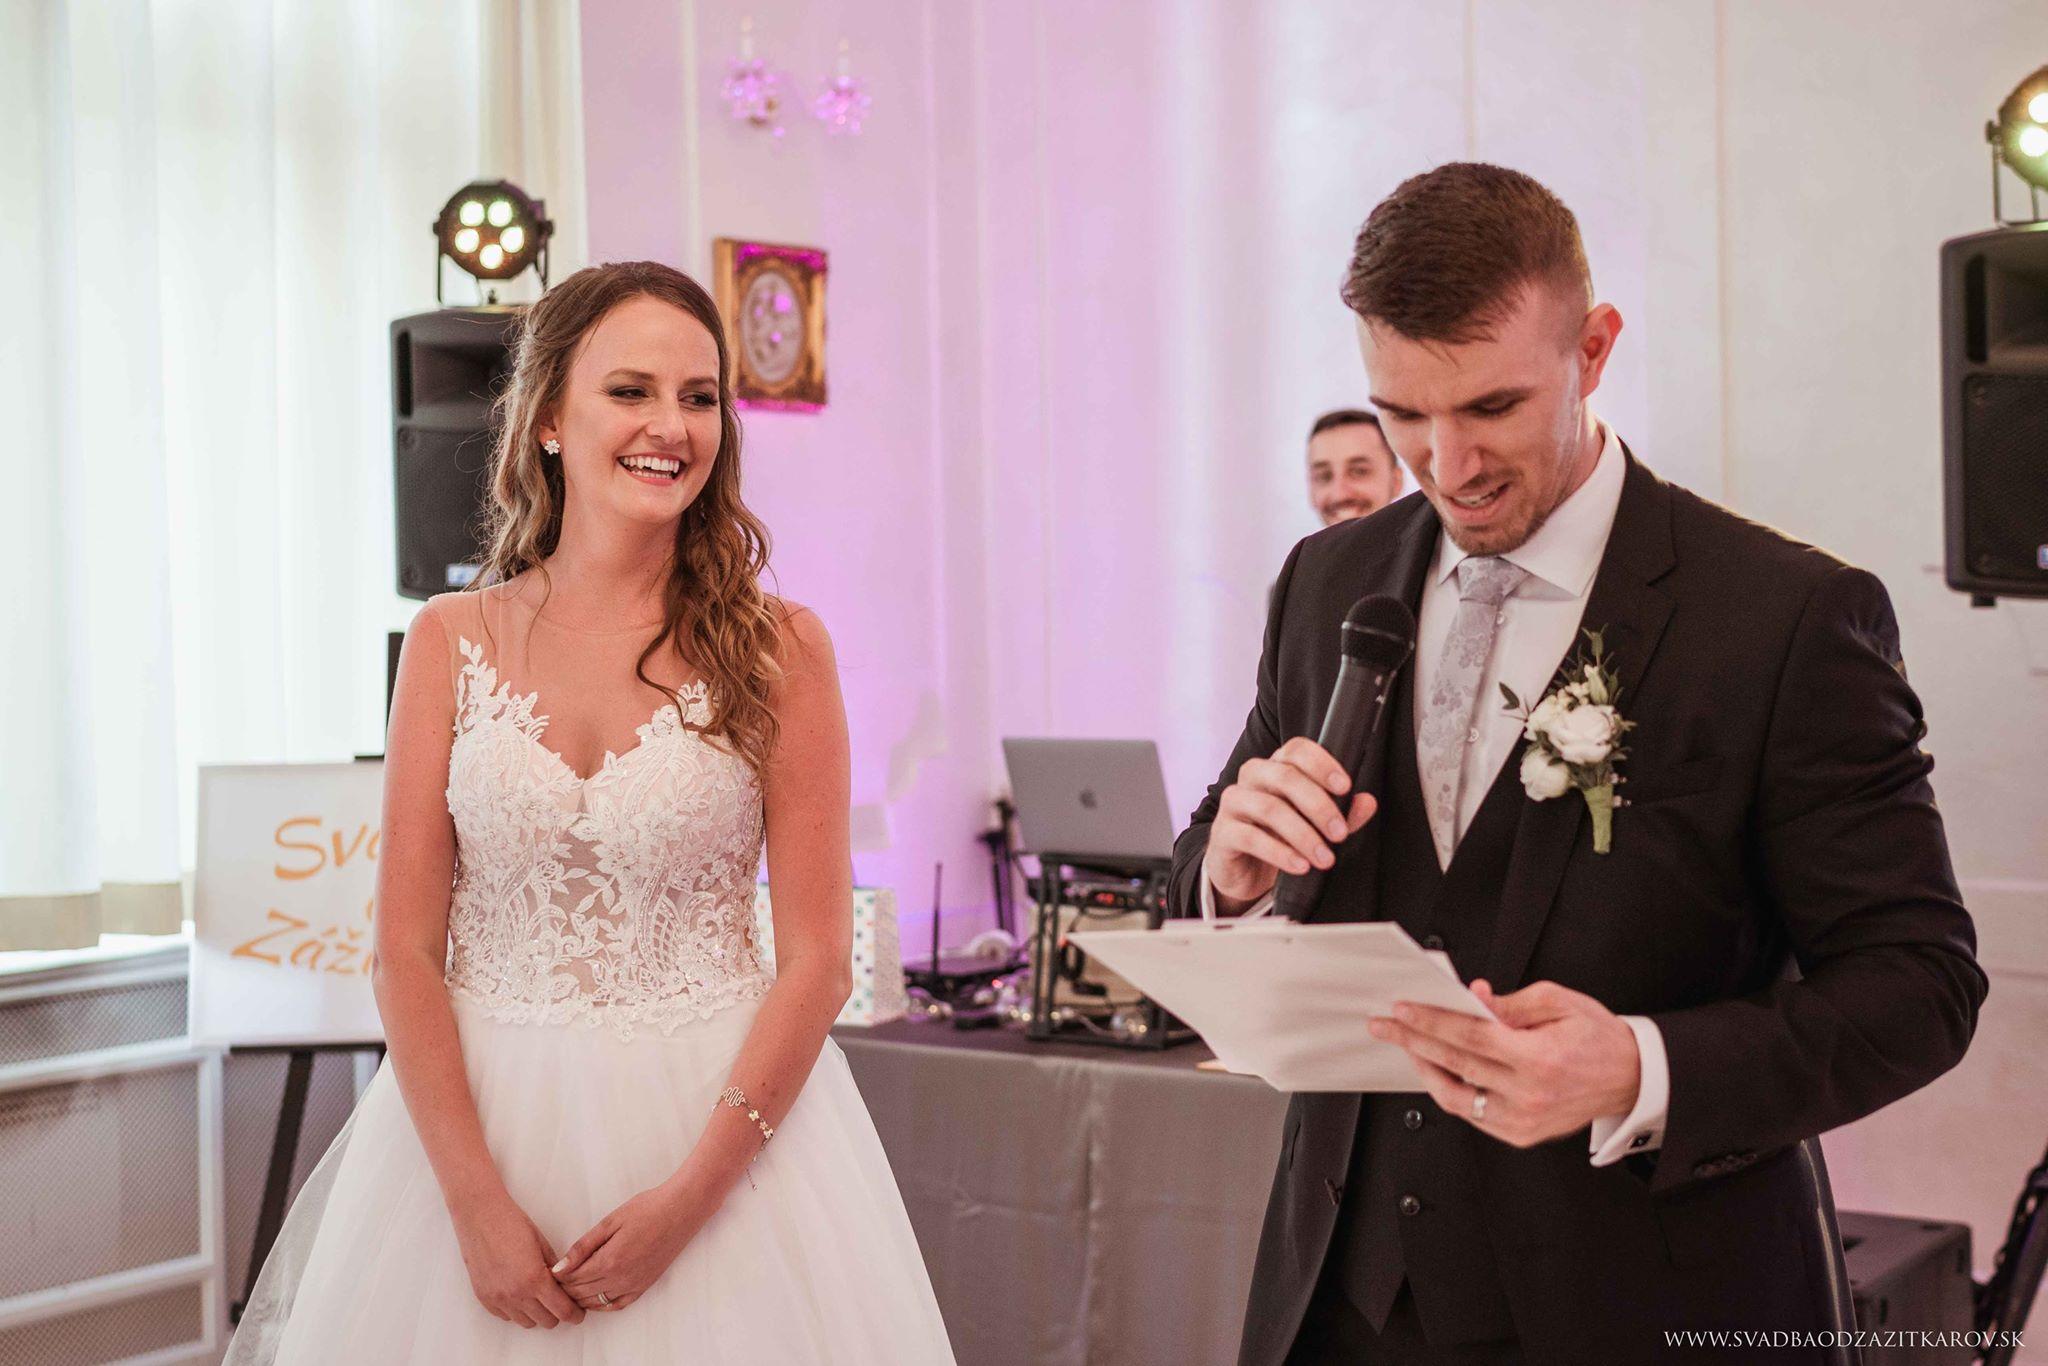 svadba-mladomanzelia-wedding-slovakiajpg